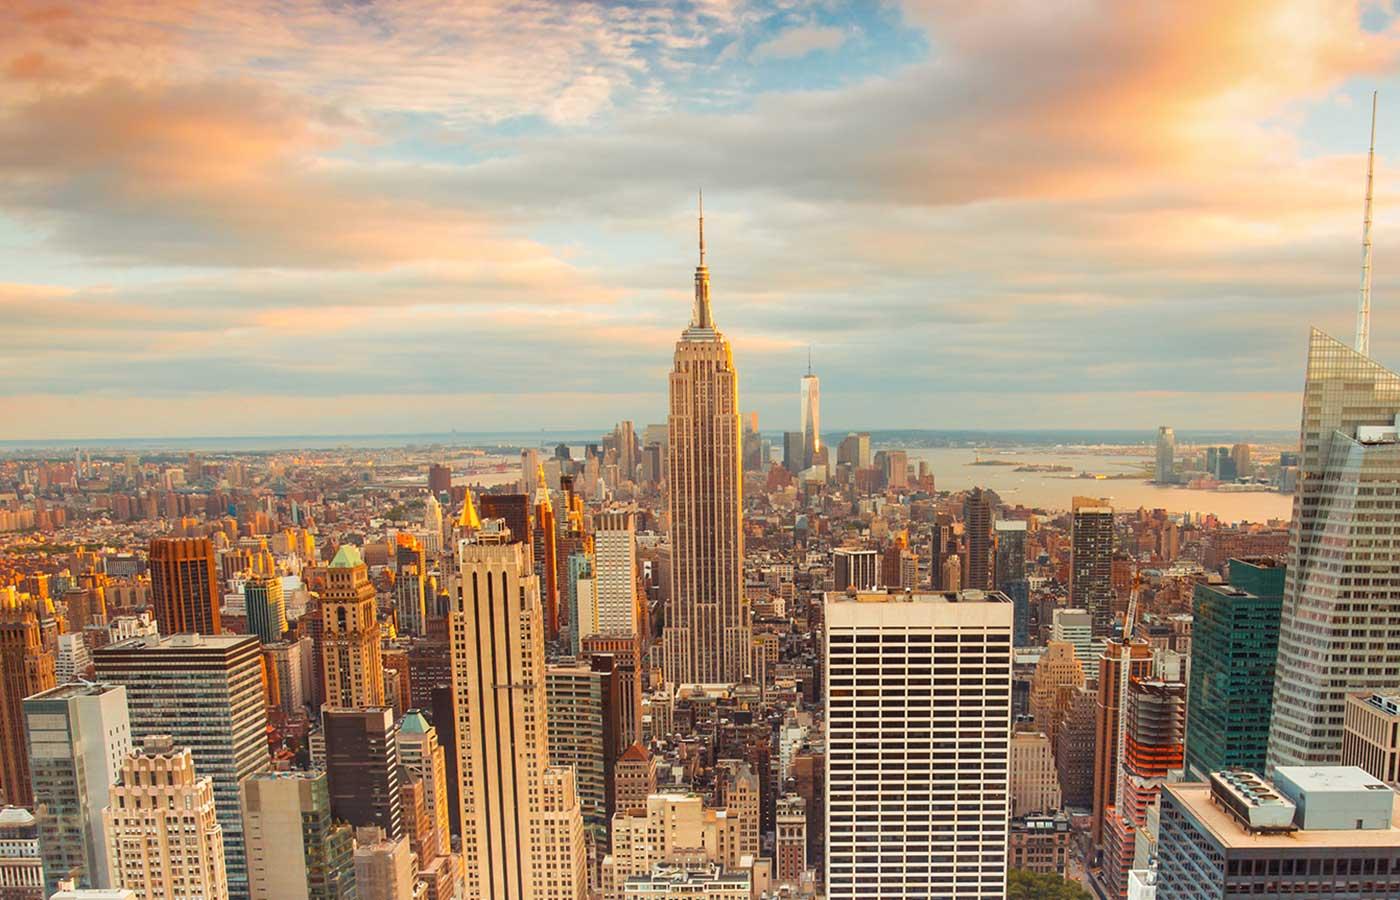 New York Skyline - O'Reilly Velocity Conference in New York 2018